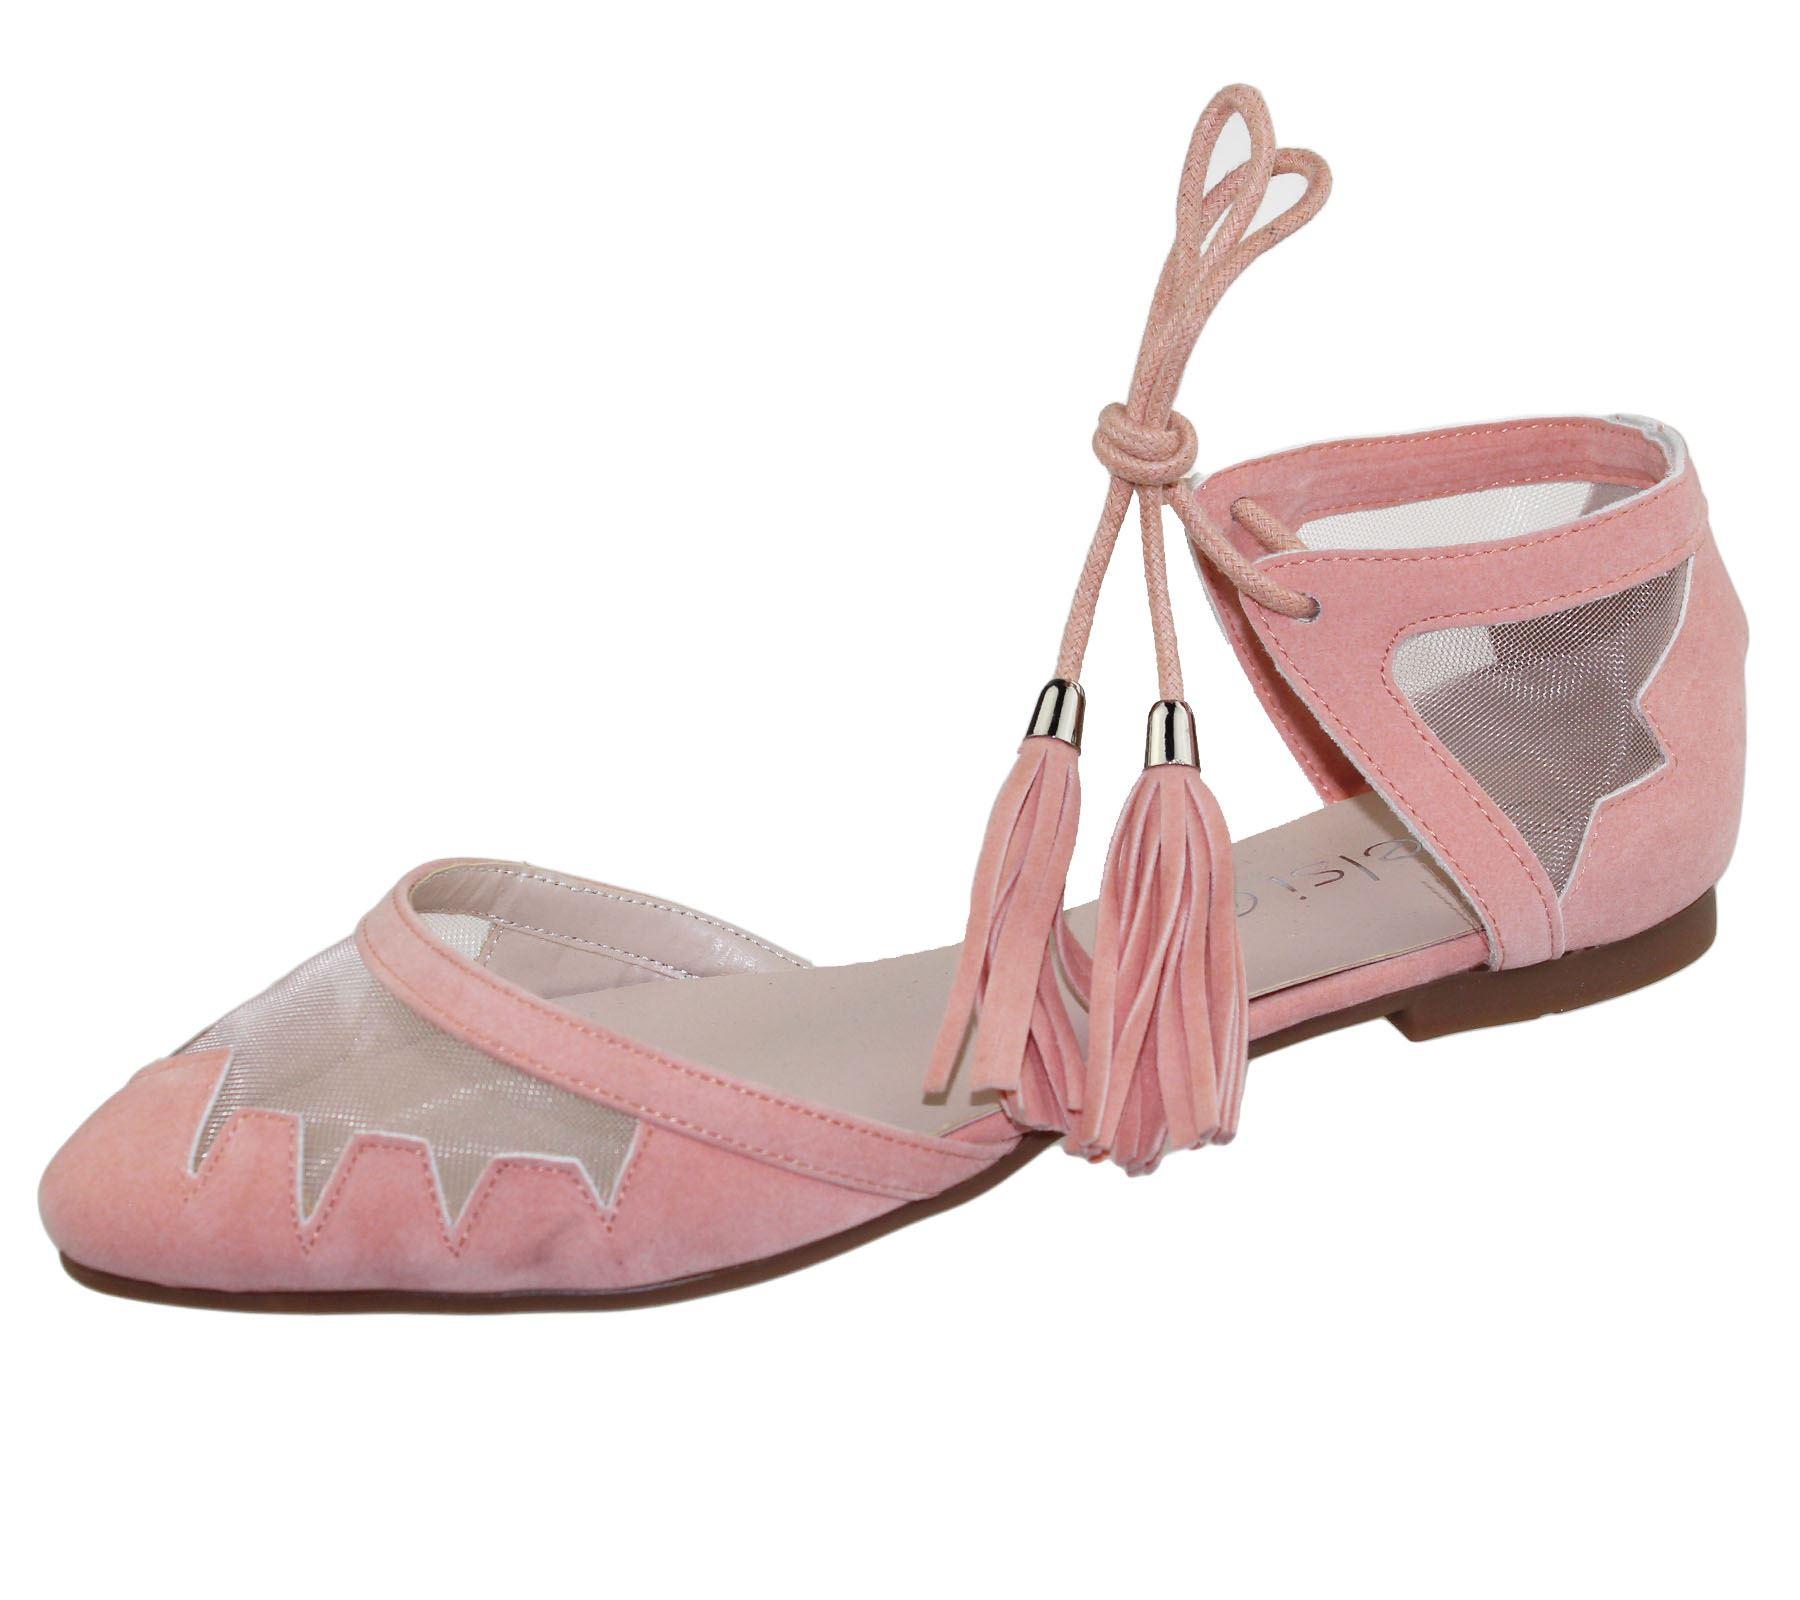 Womens-Flat-Ballerina-Dolly-Pumps-Ballet-Ladies-Summer-Mesh-Tassel-Shoes-Sandals thumbnail 29